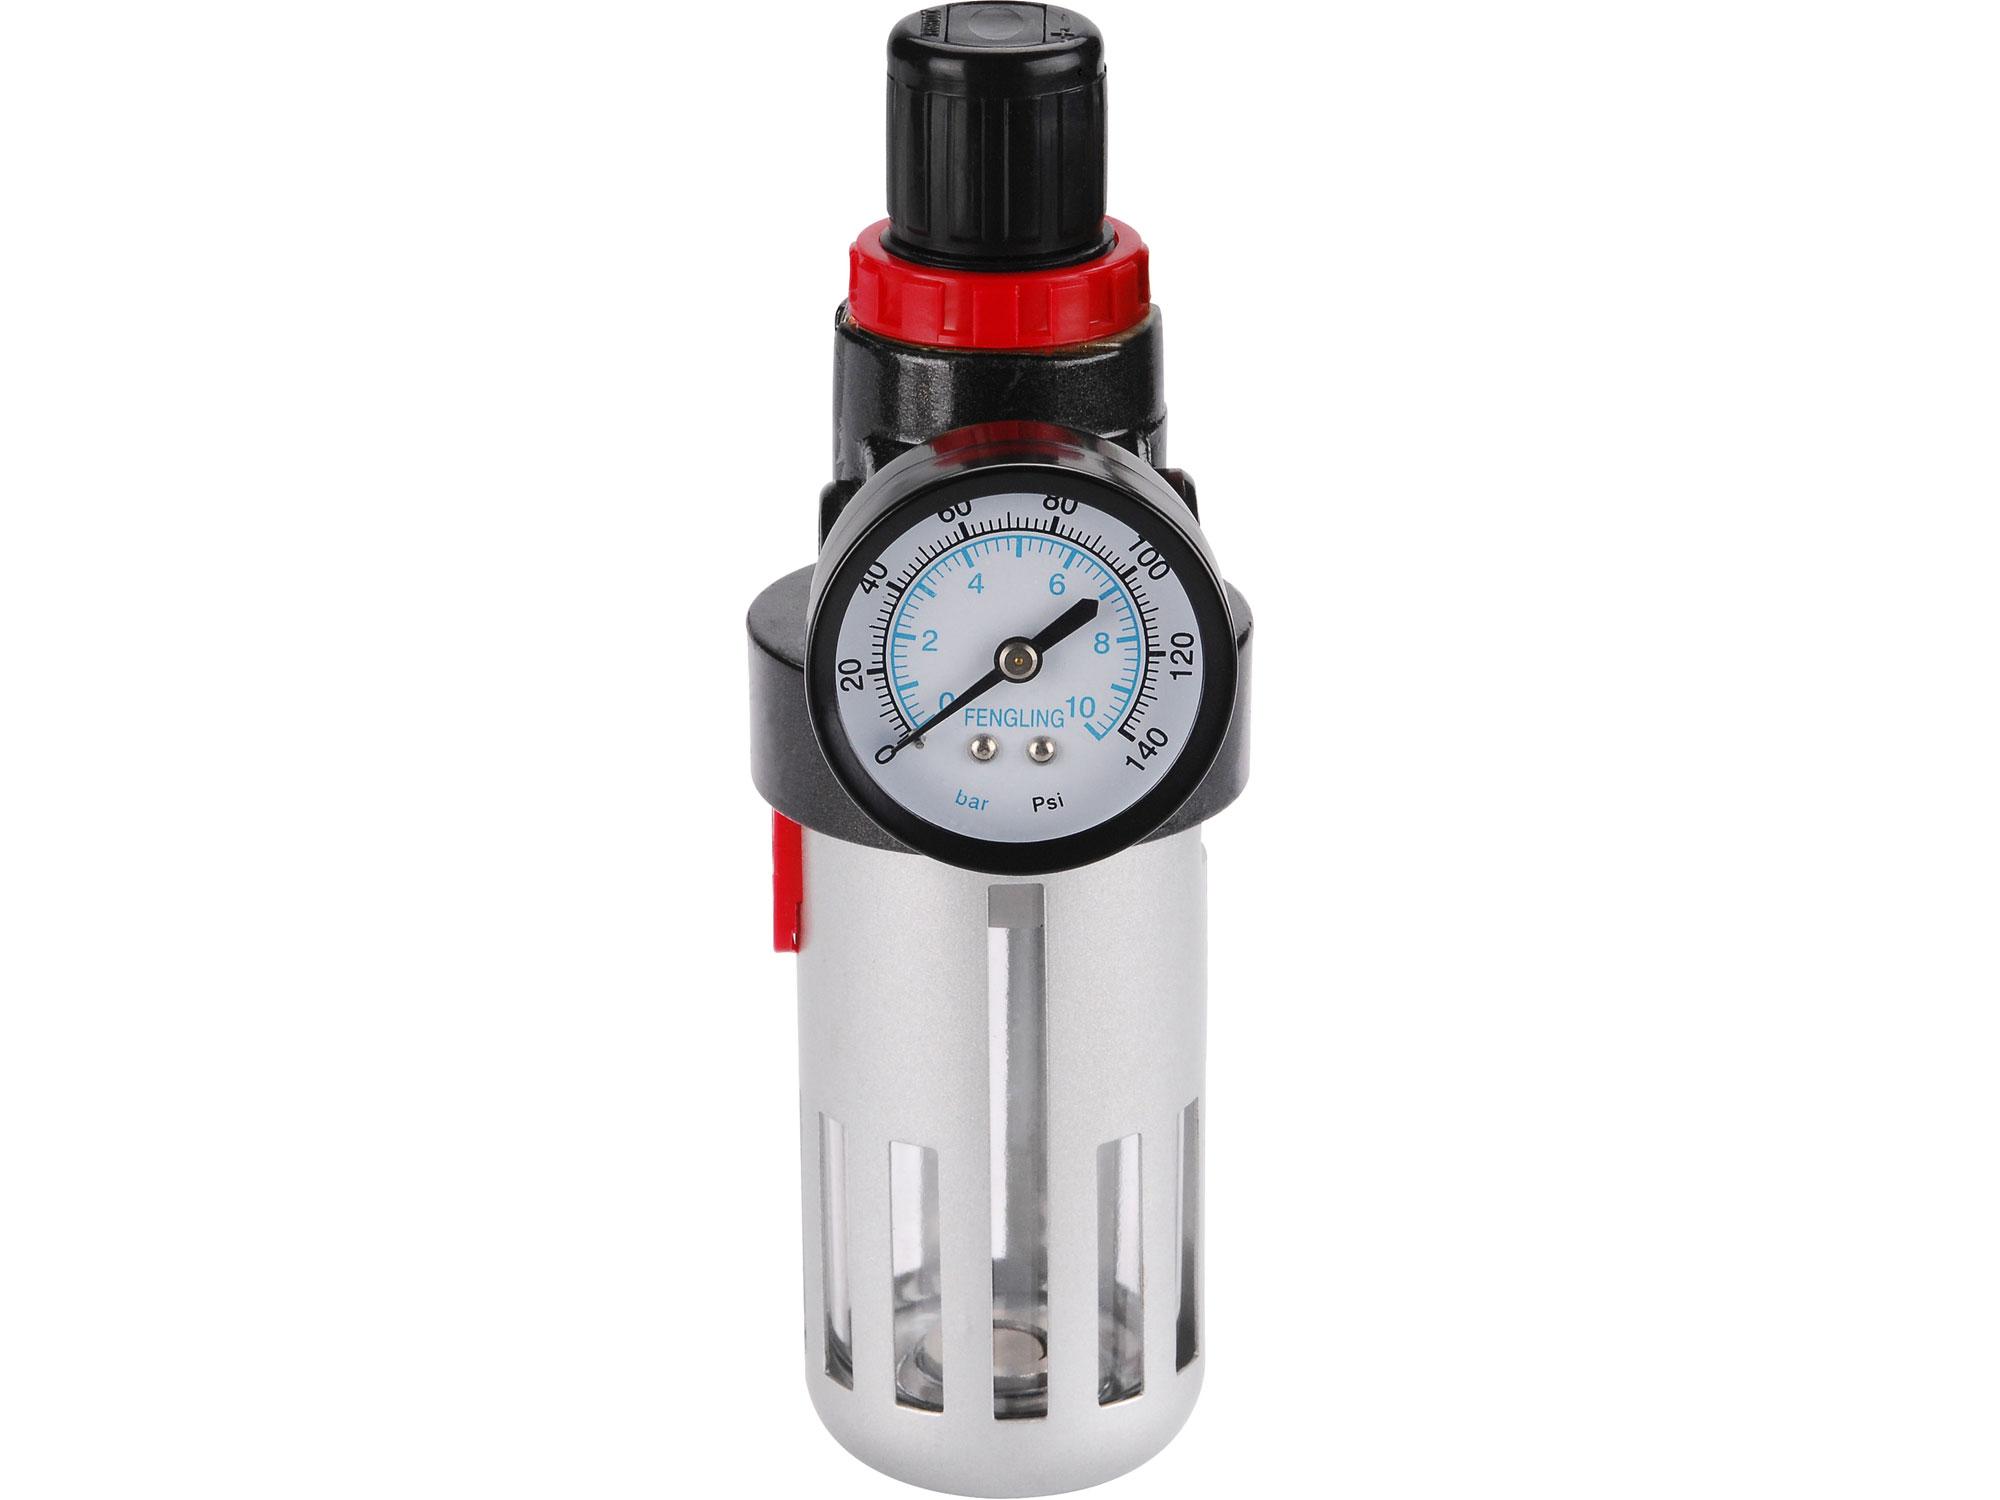 "Regulátor tlaku s olejovým filtrem s manometrem konektor 1/4"" EXTOL PREMIUM 8865104"